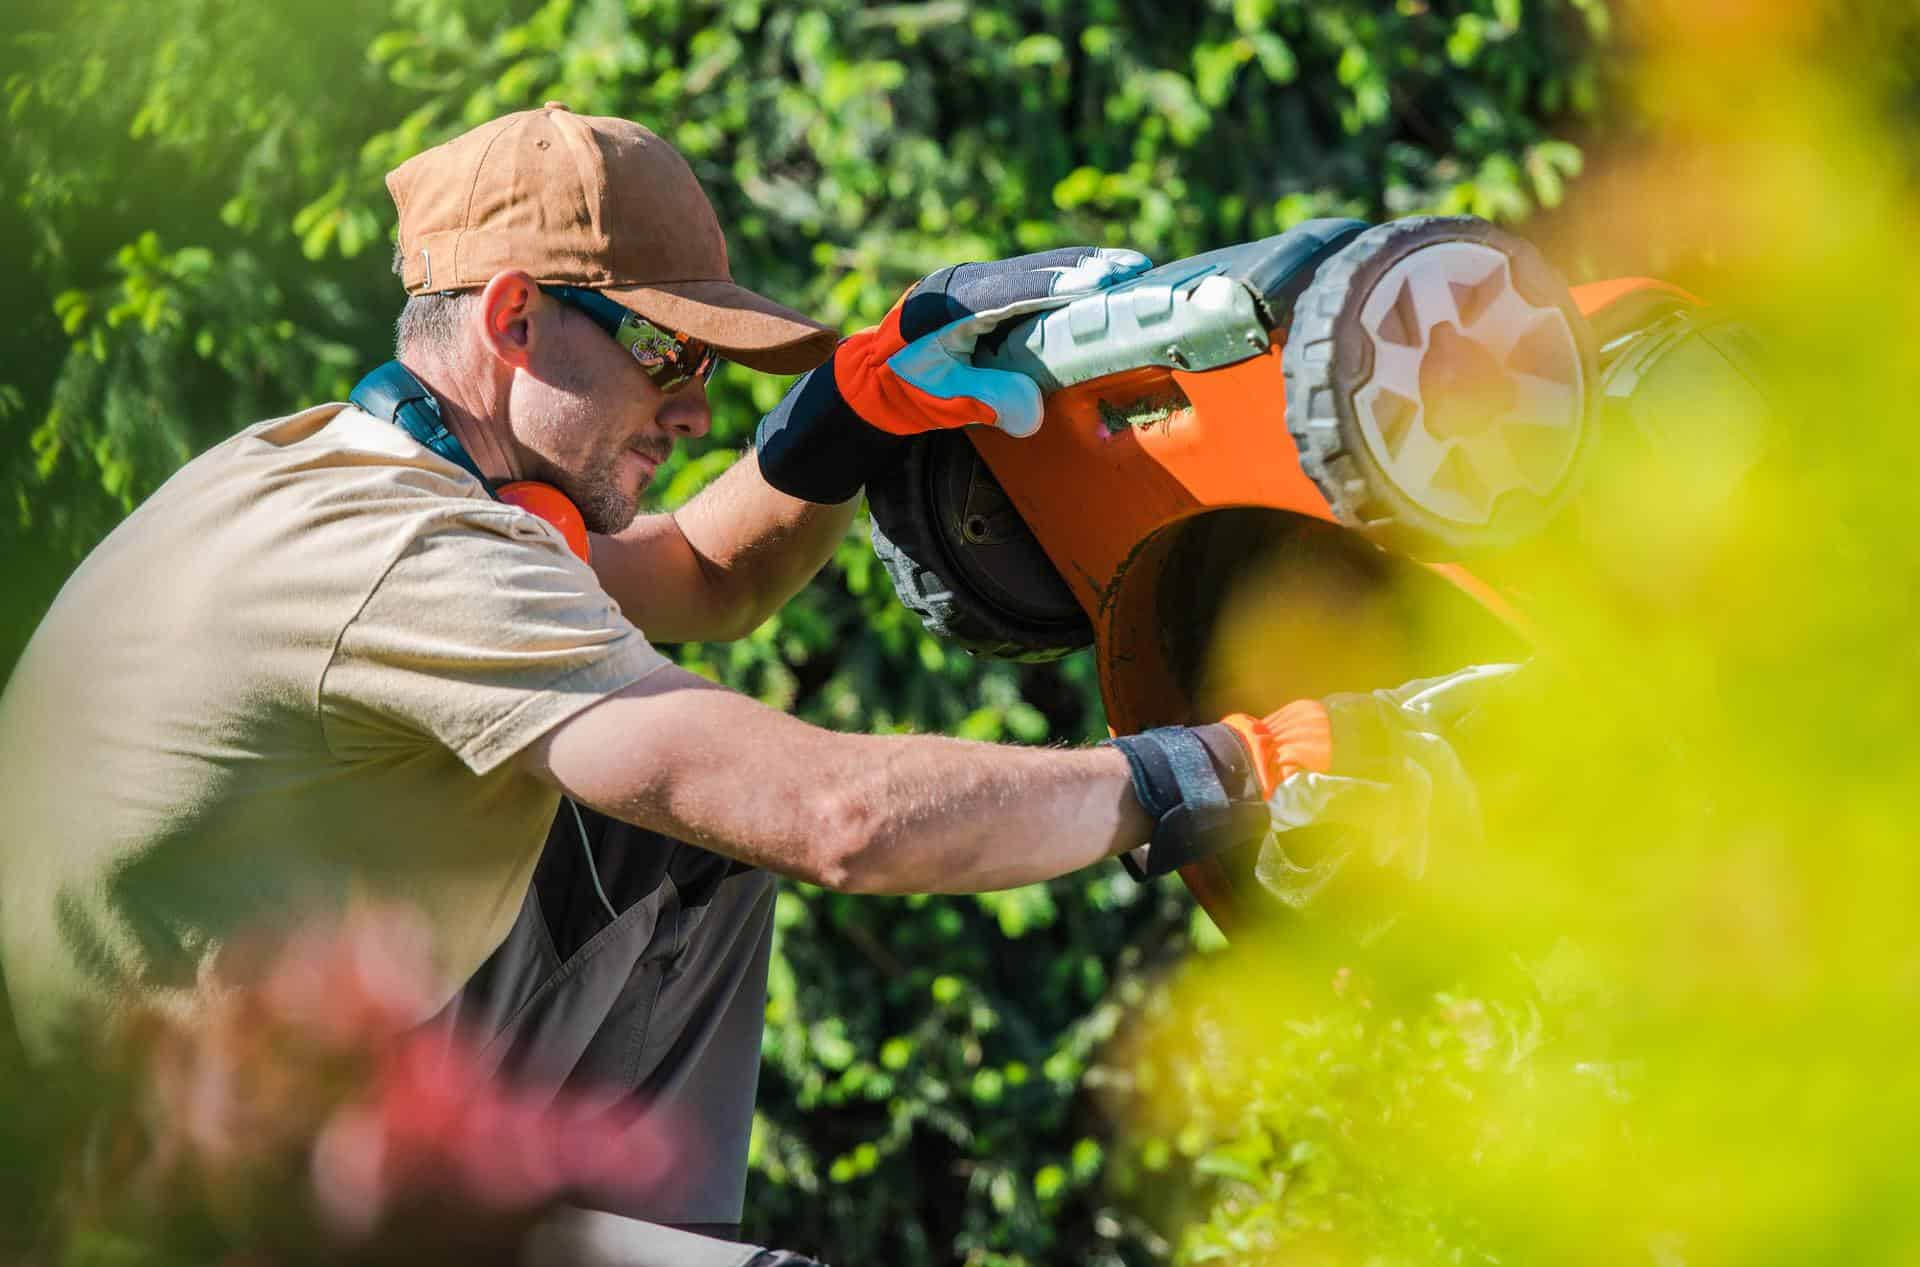 Men Fixing Lawn Mower